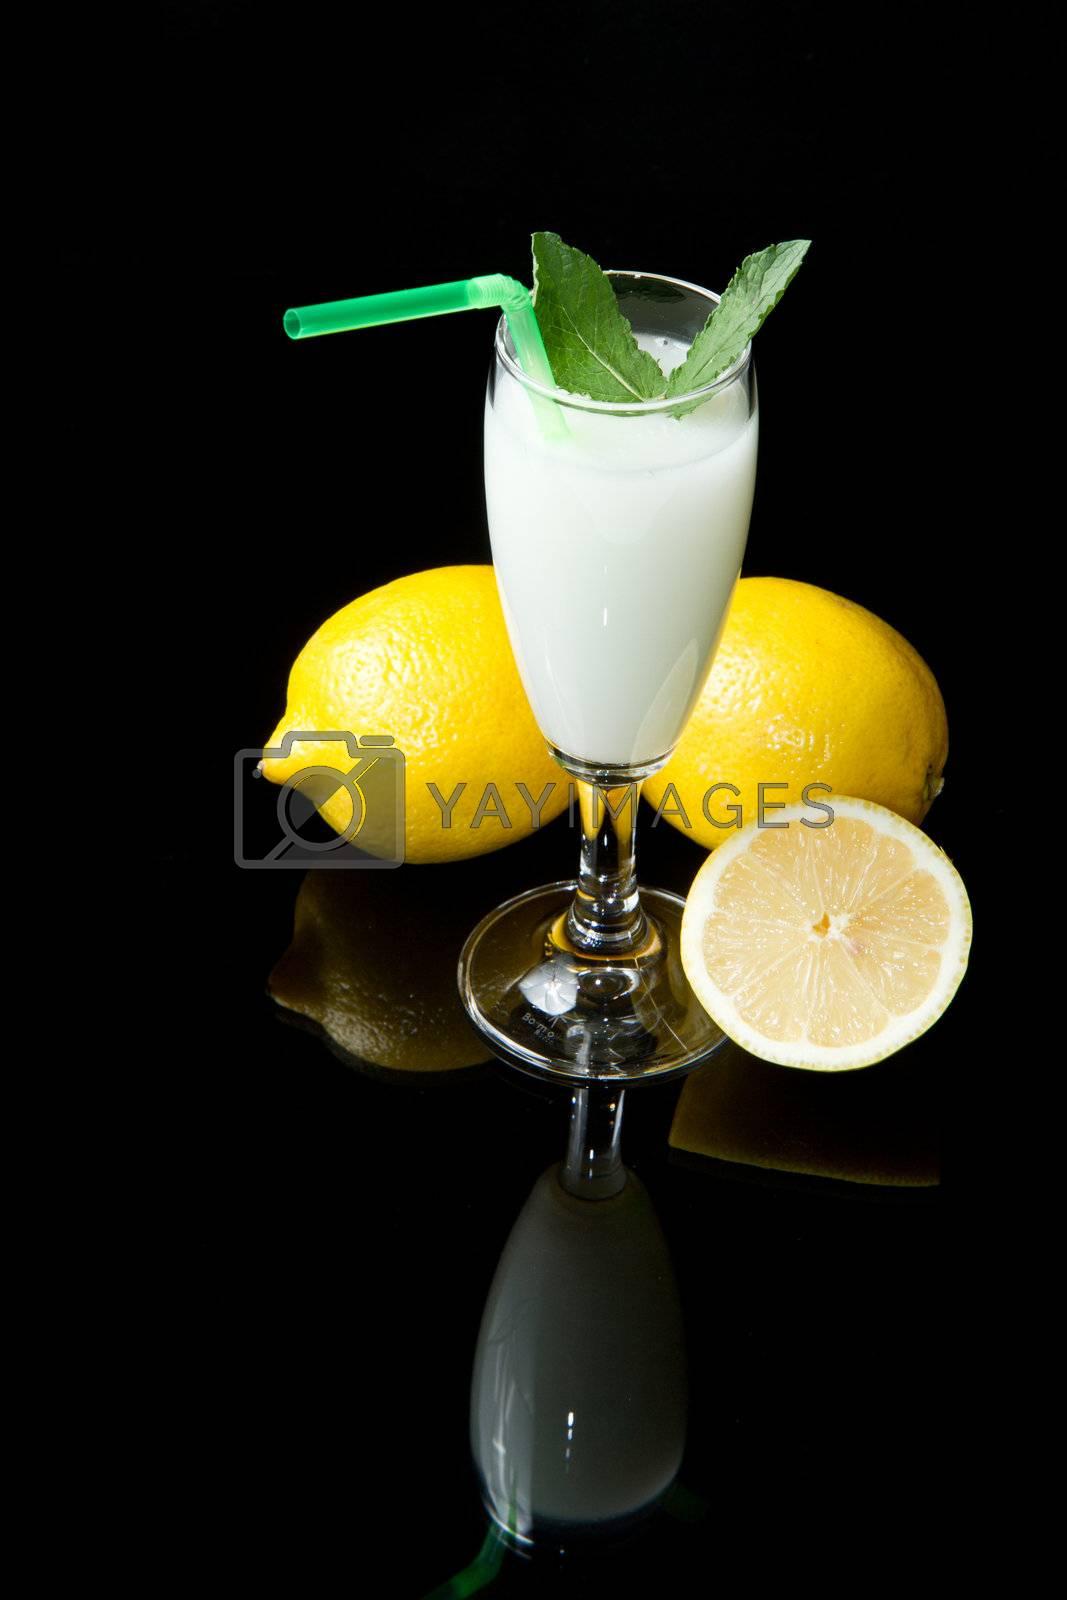 lemon sorbet on black background